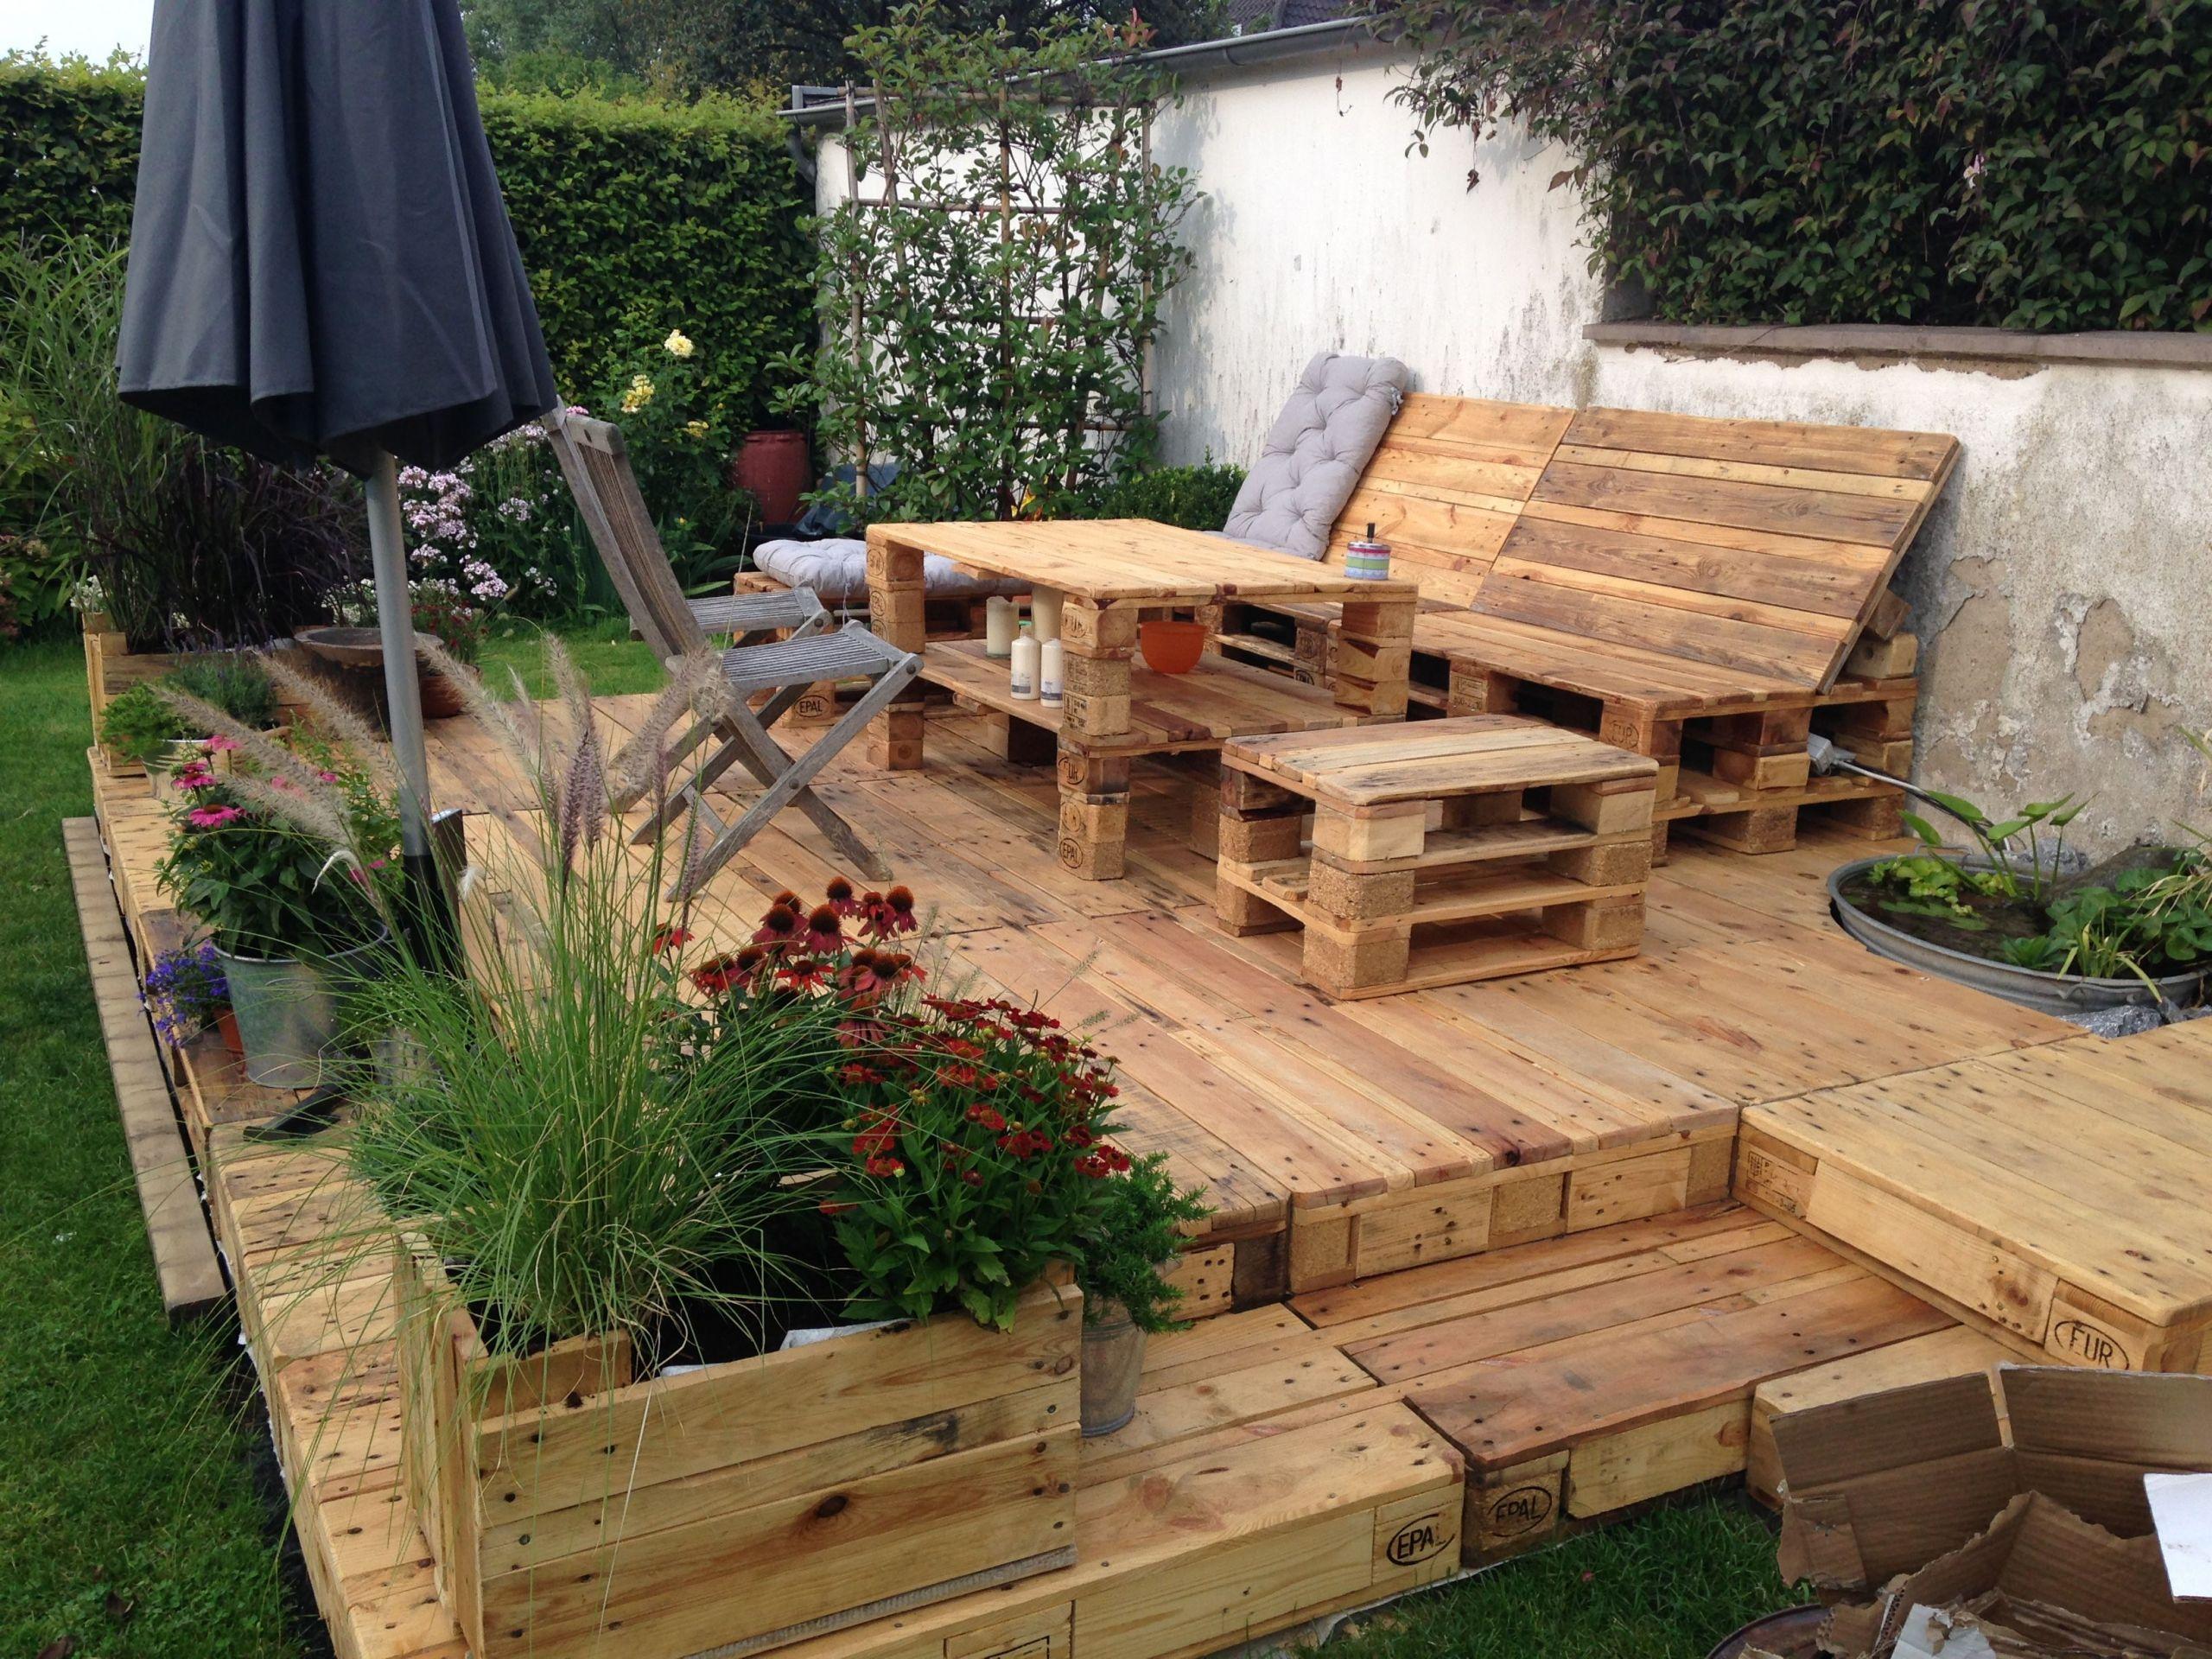 46 Genial Sitzecke Garten Selber Bauen Garten Deko